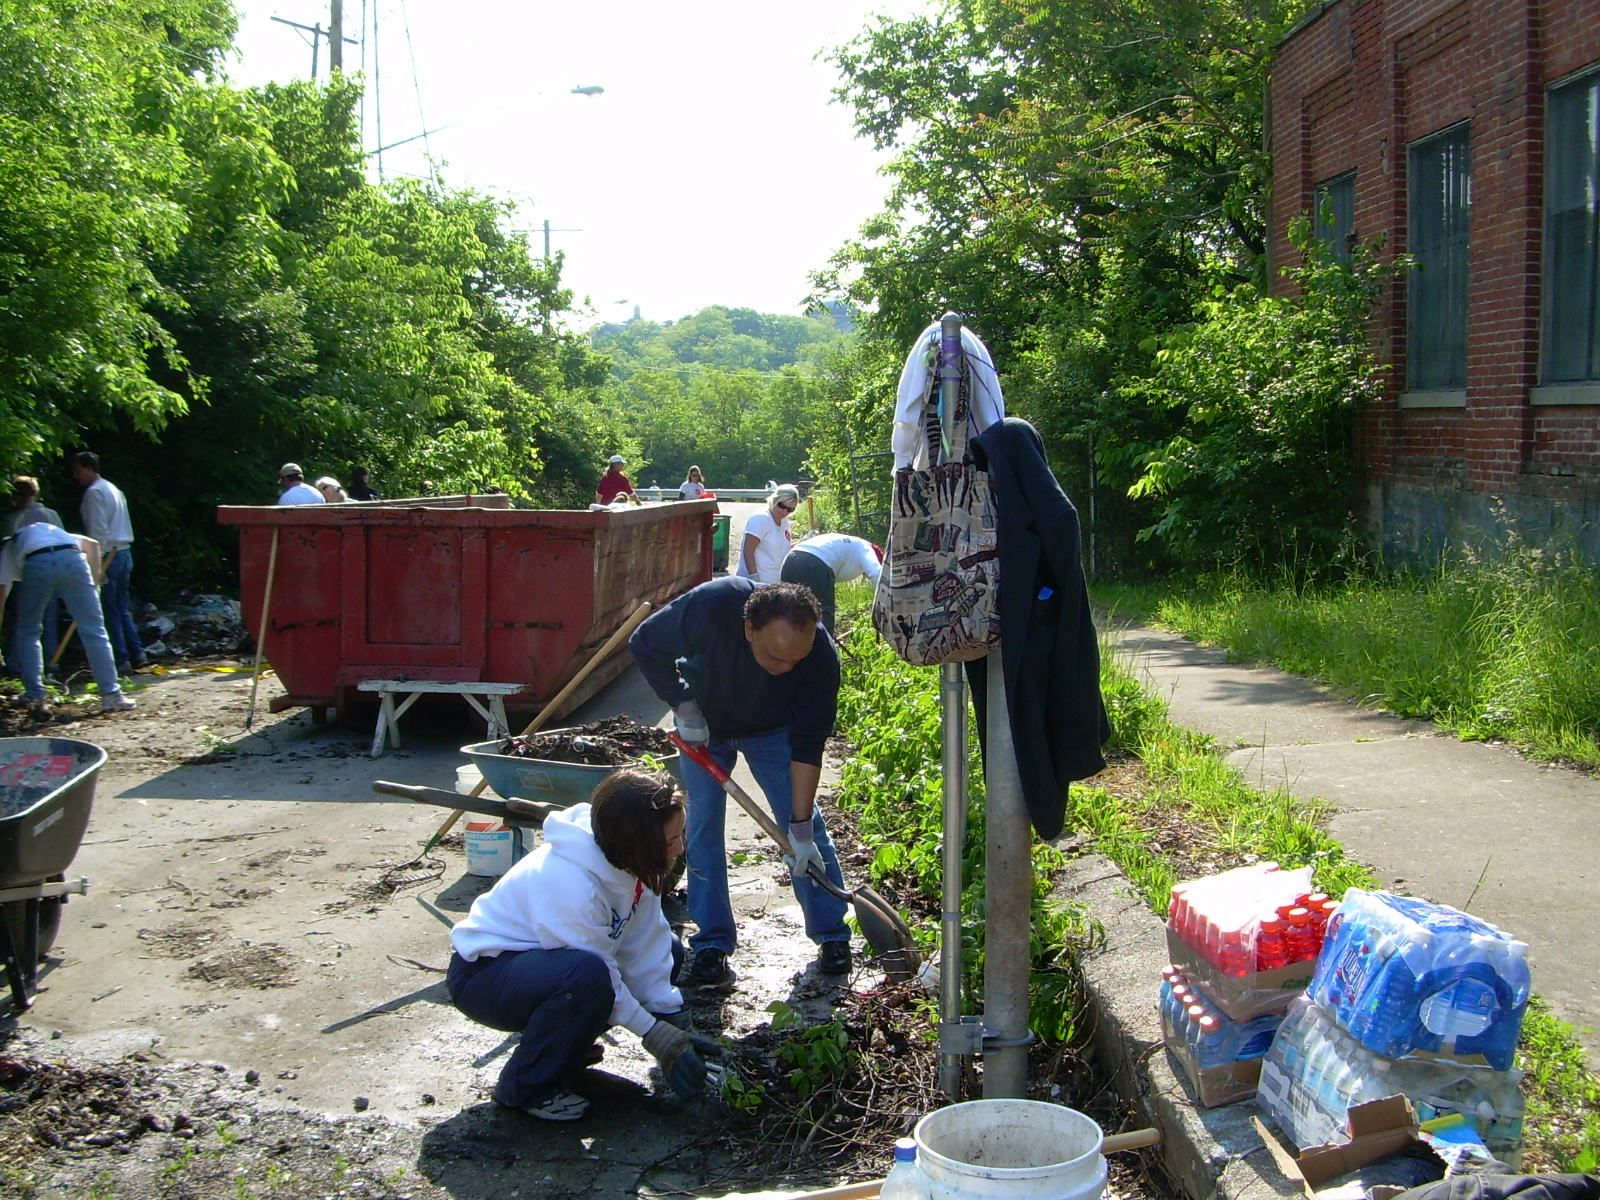 Neighborhood Spotlight: Avondale